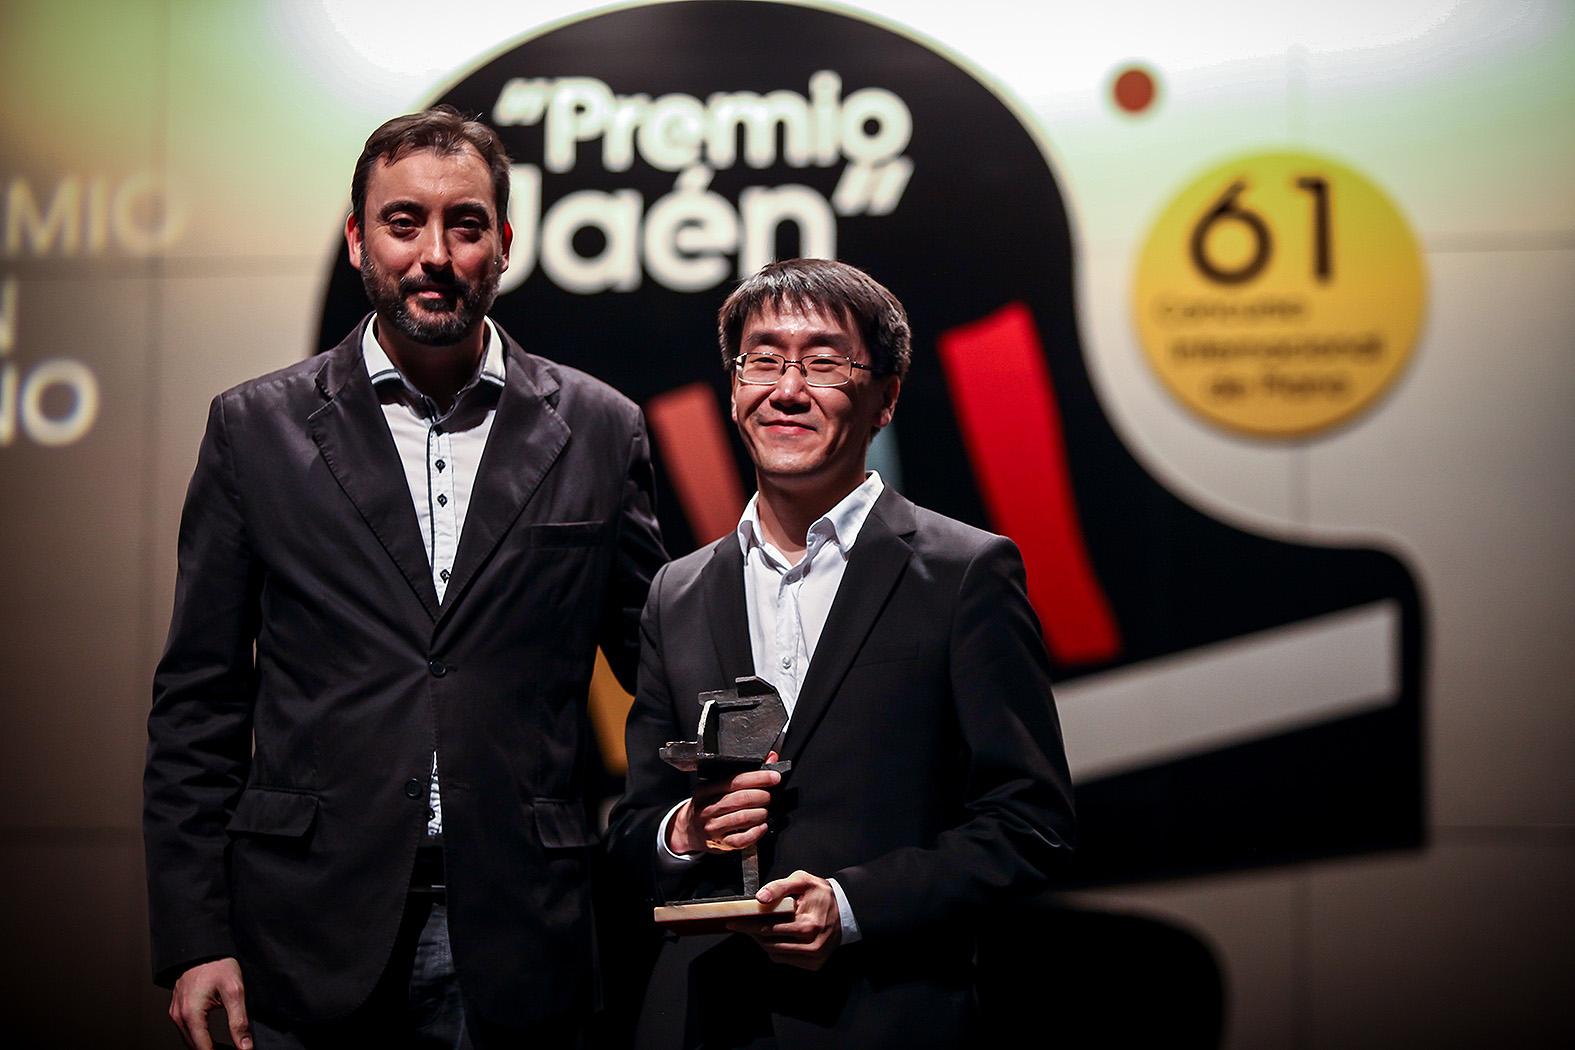 Premio del público: Alexander Koryakin